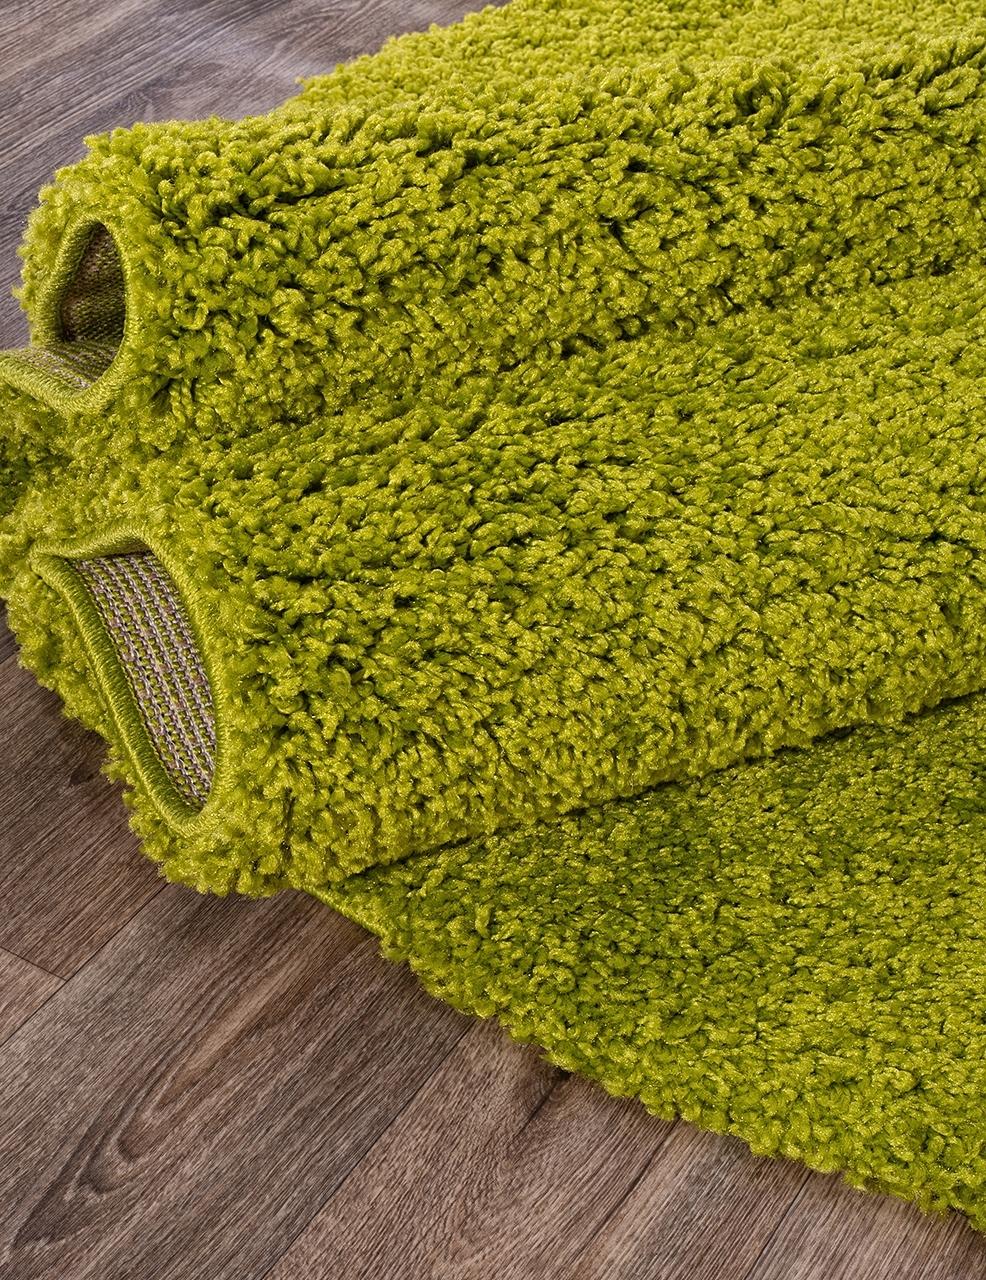 Ковер s600 - GREEN - Овал - коллекция SHAGGY ULTRA - фото 3